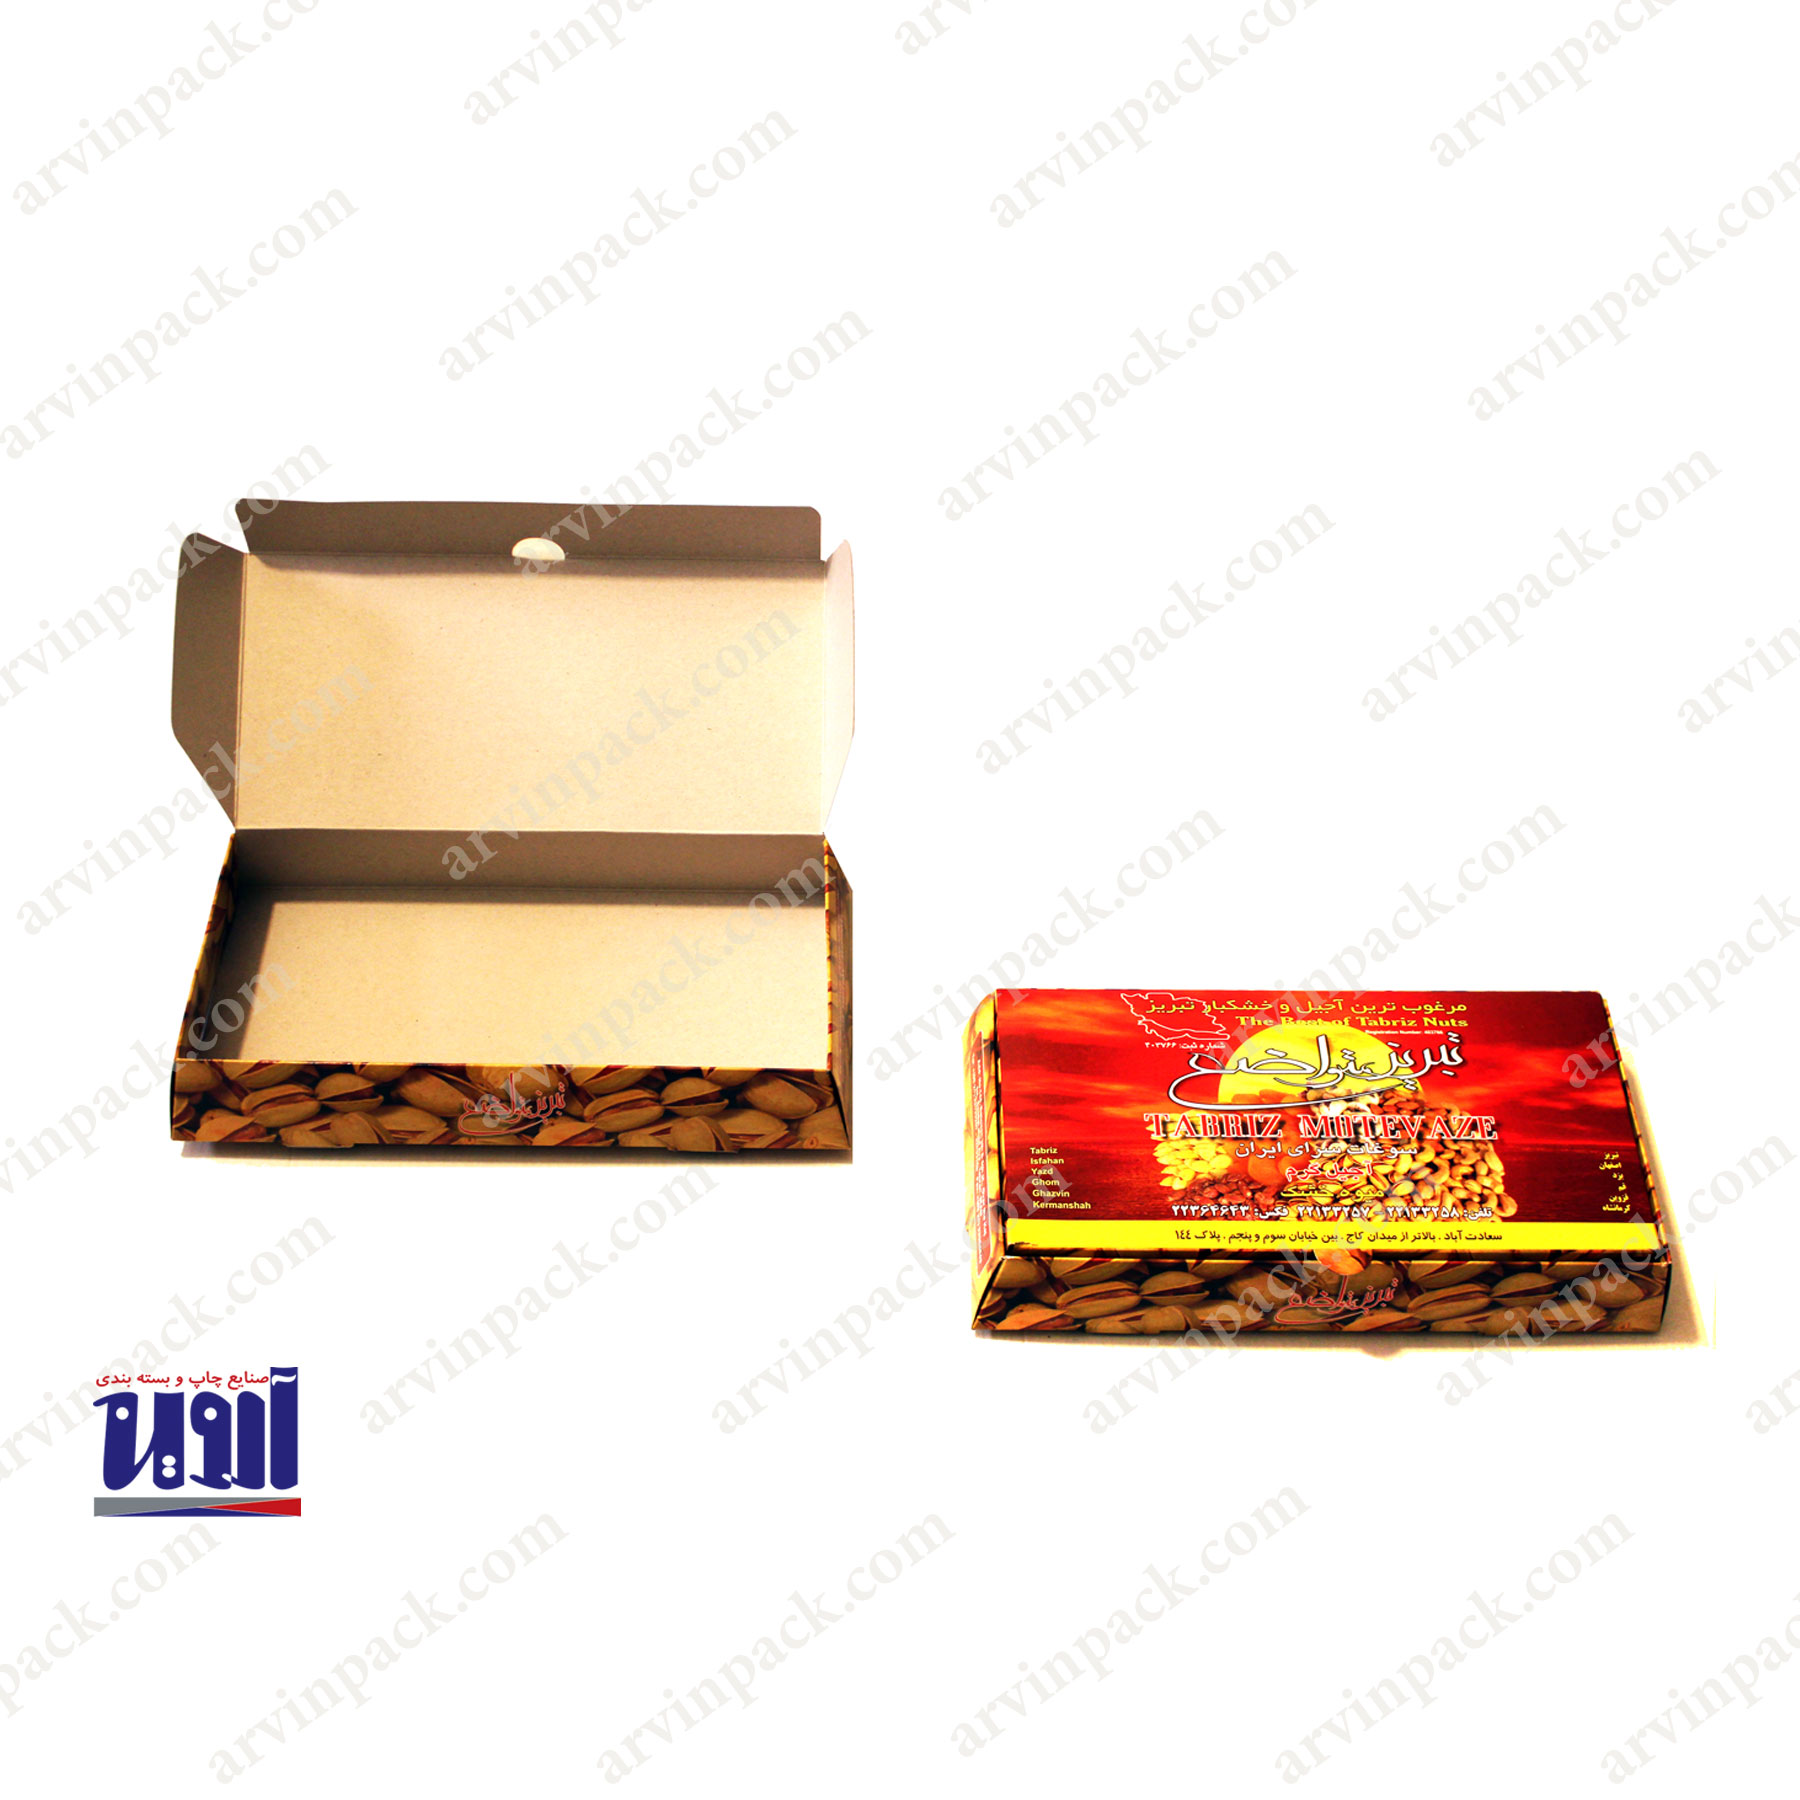 جعبه پسته ، بسته بندی خشکبار و آجیل ، بسته بندی خشکبار